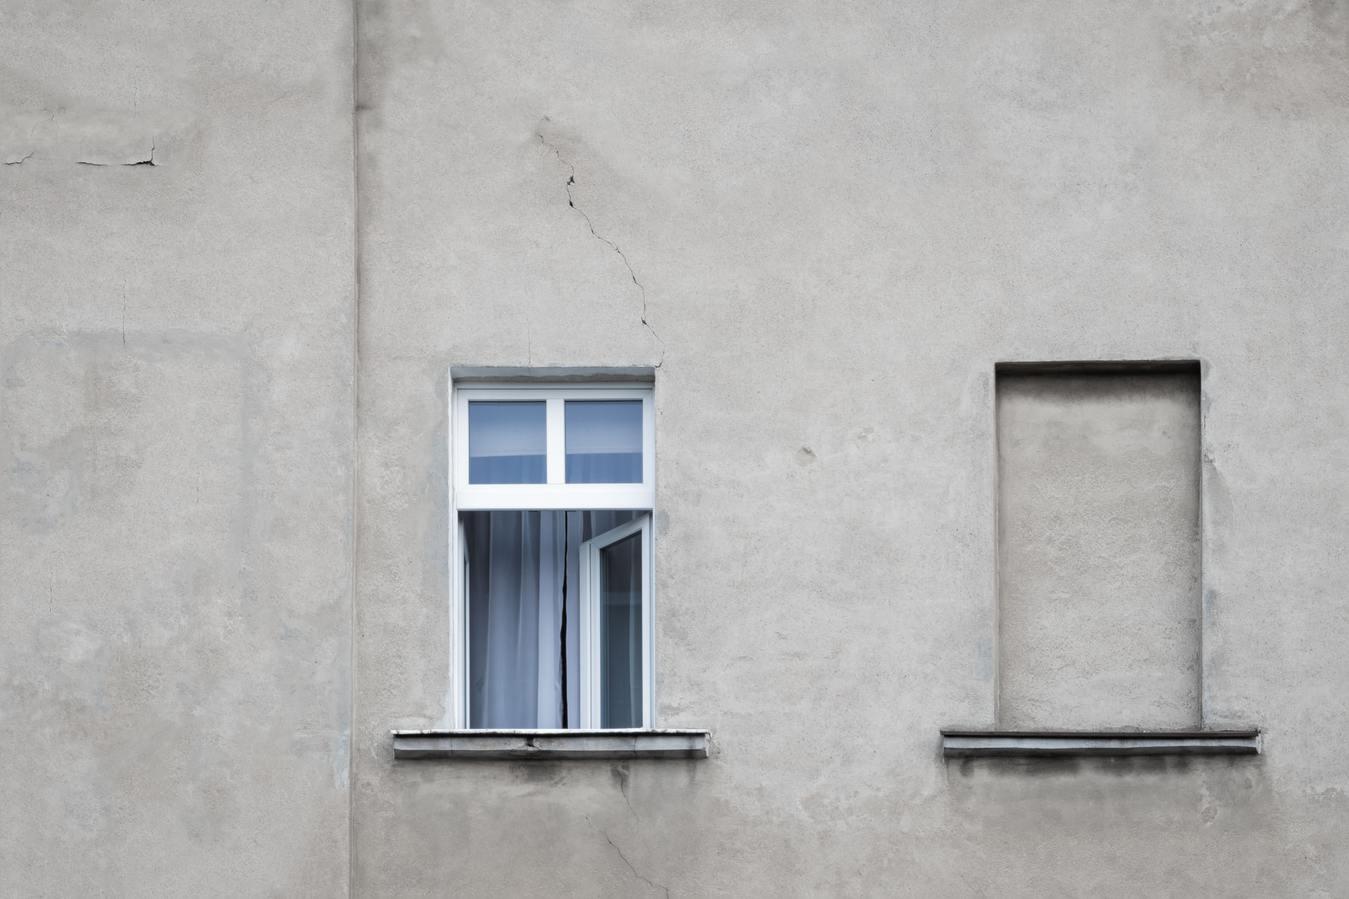 Fenster offen und anderes Fenster zementiert geschlossene Nische